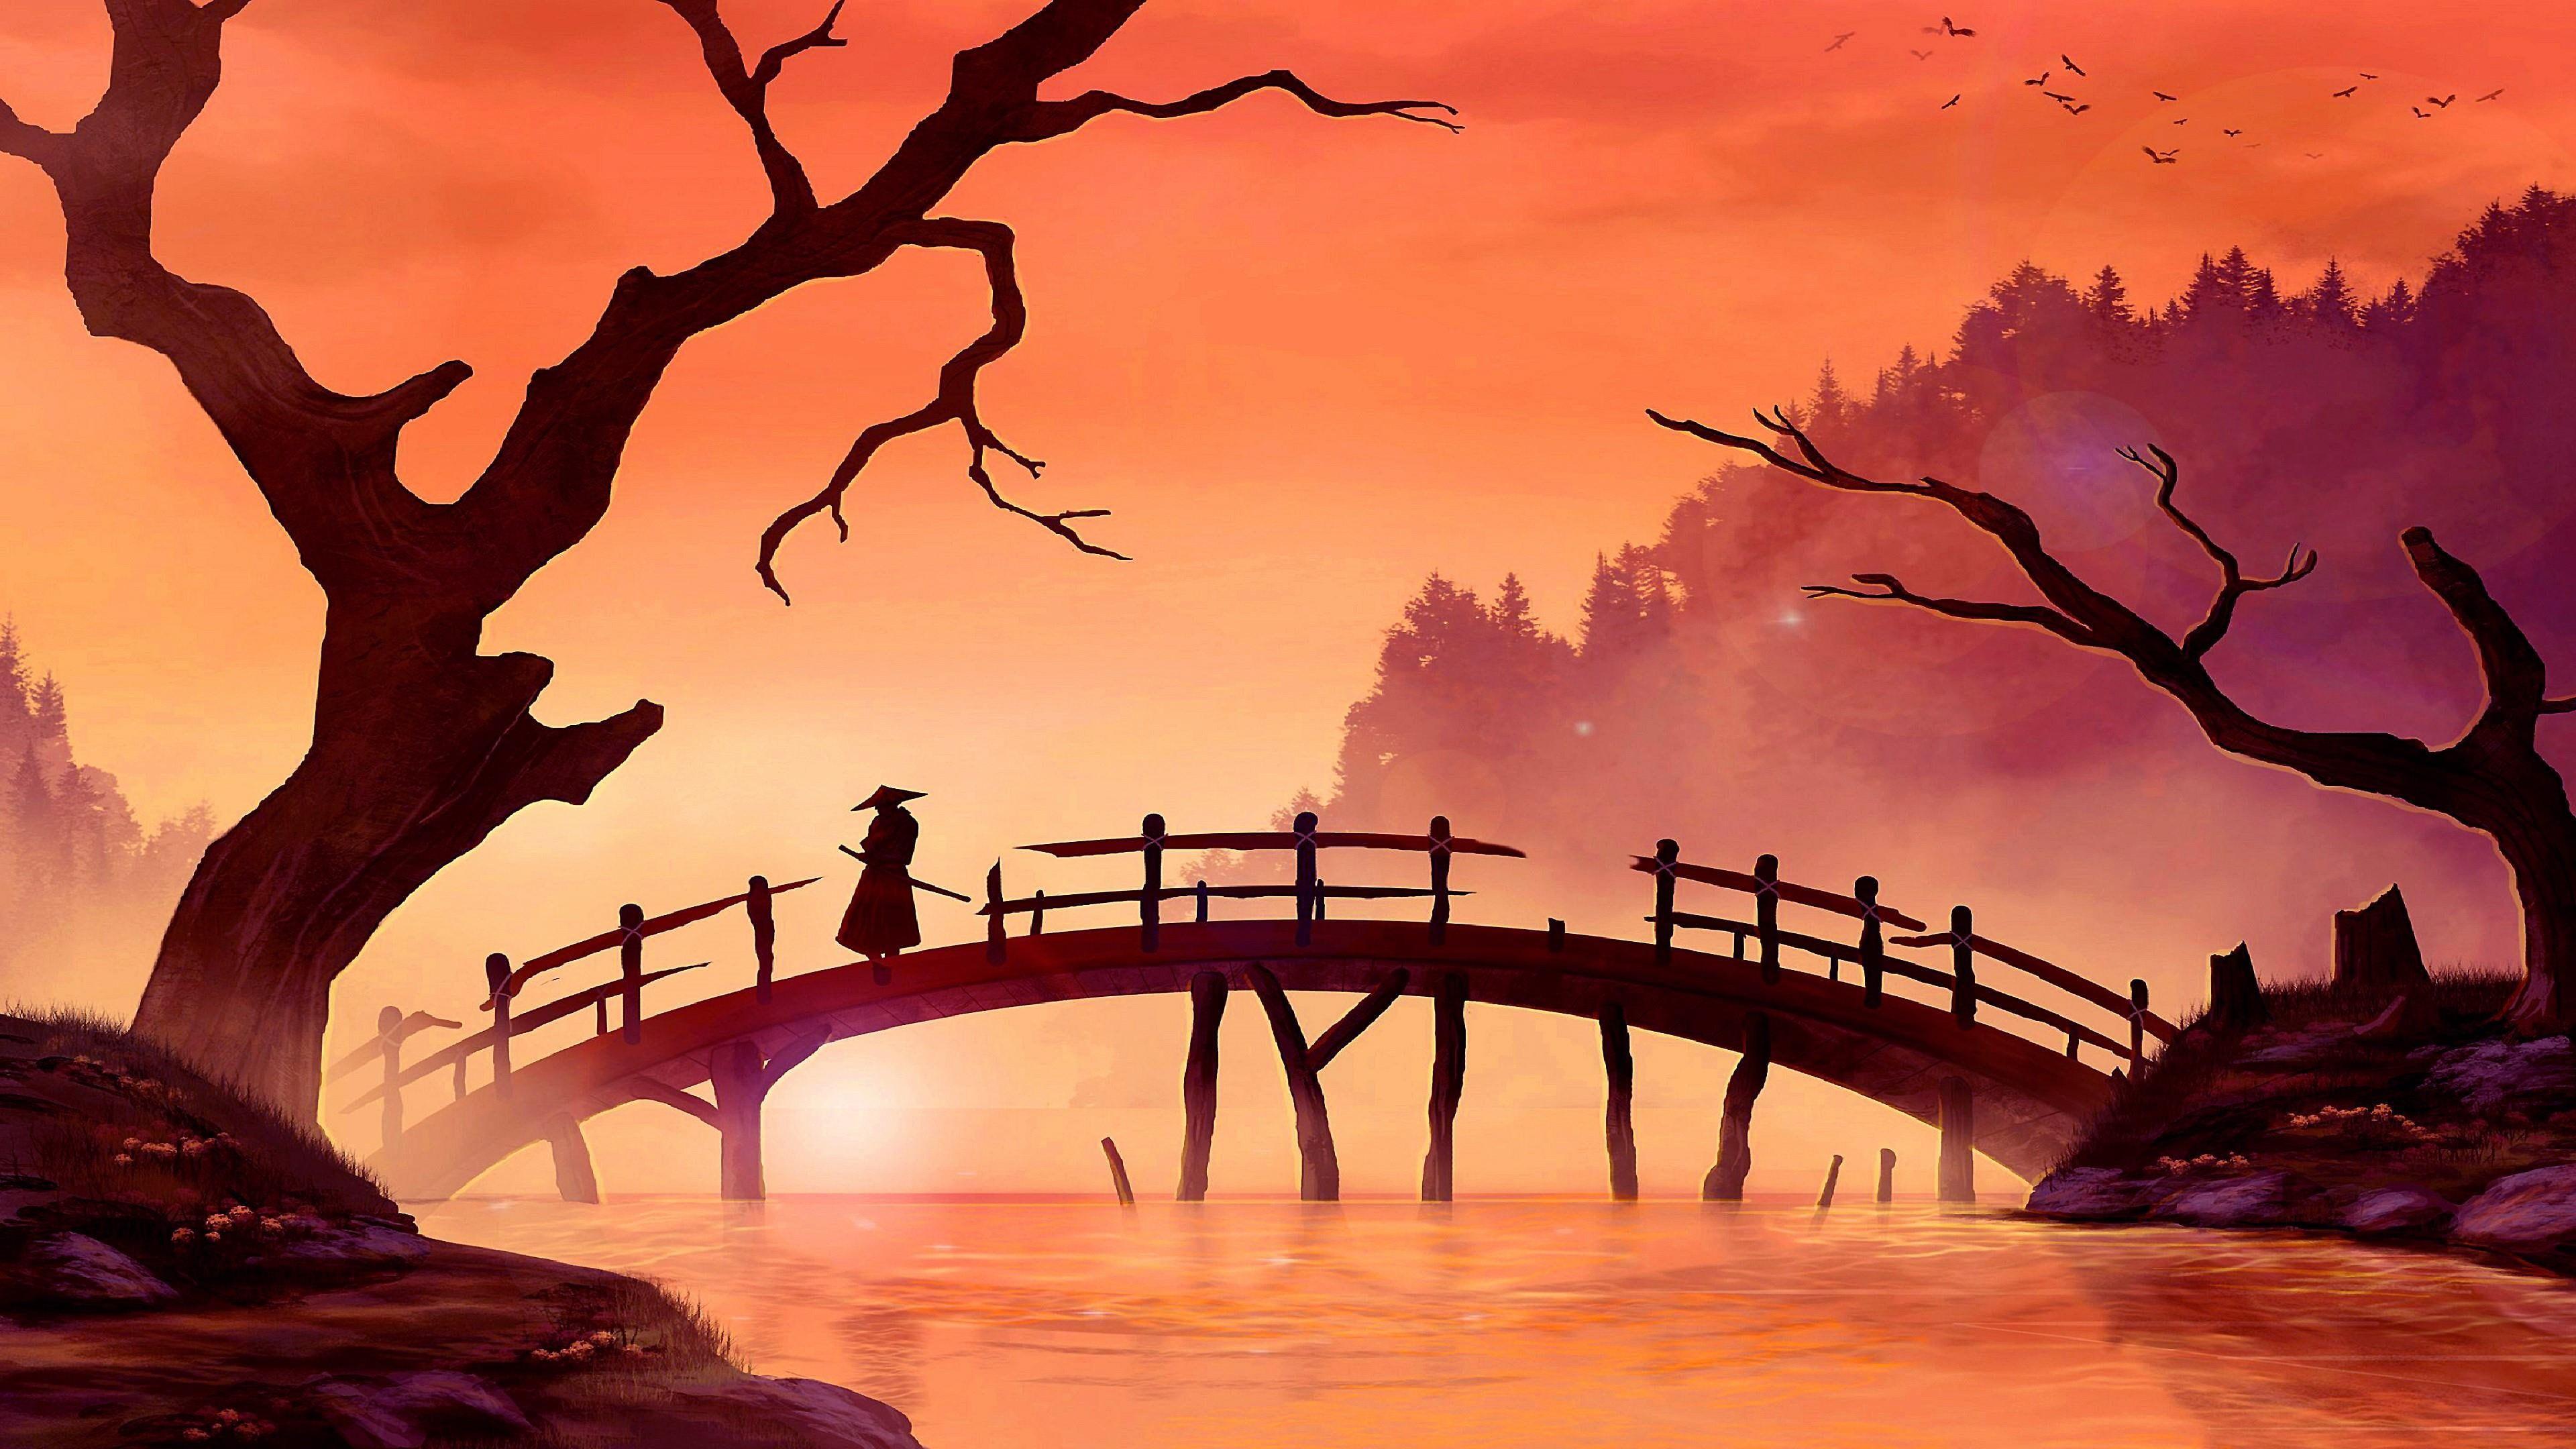 Samurai Bridge Painting Art Sunset River Landscape Branch Tree Japan Art Art Artwork 4k Wallpaper Hdw Forest Painting Nature Art Japanese Landscape